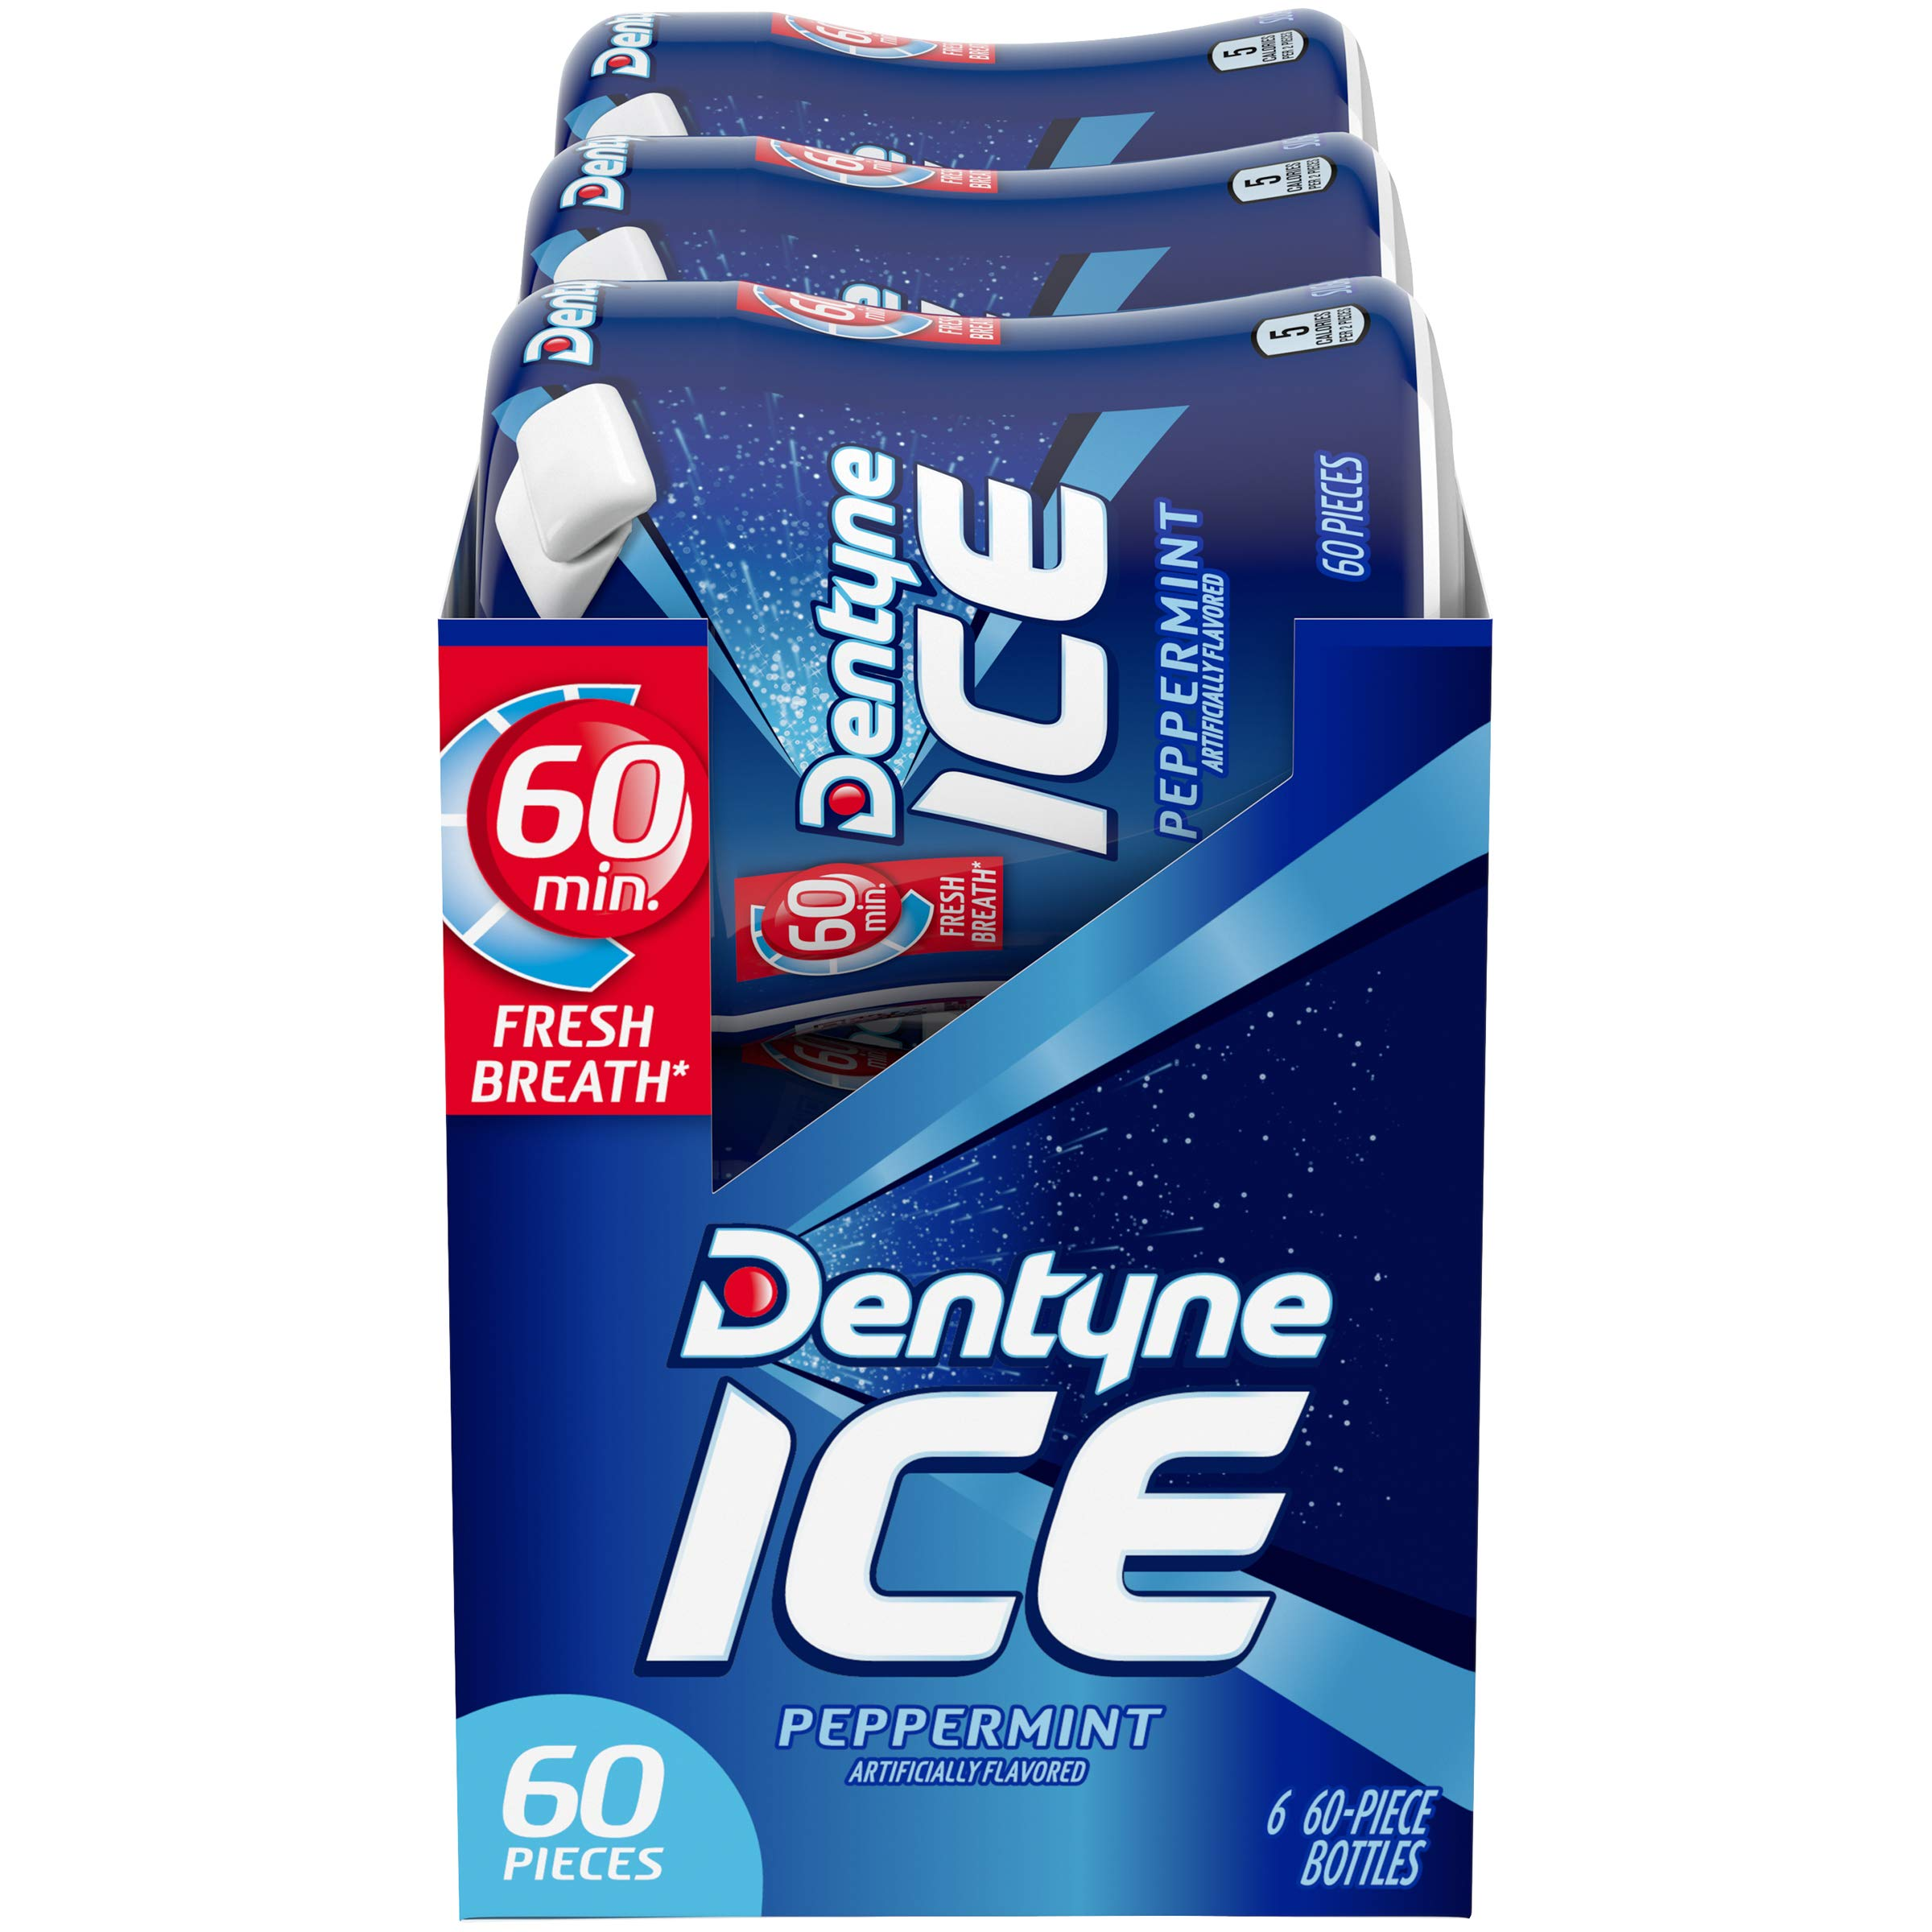 Dentyne Ice Sugar Free Gum (Peppermint, 60 Piece, Pack of 6) by Dentyne